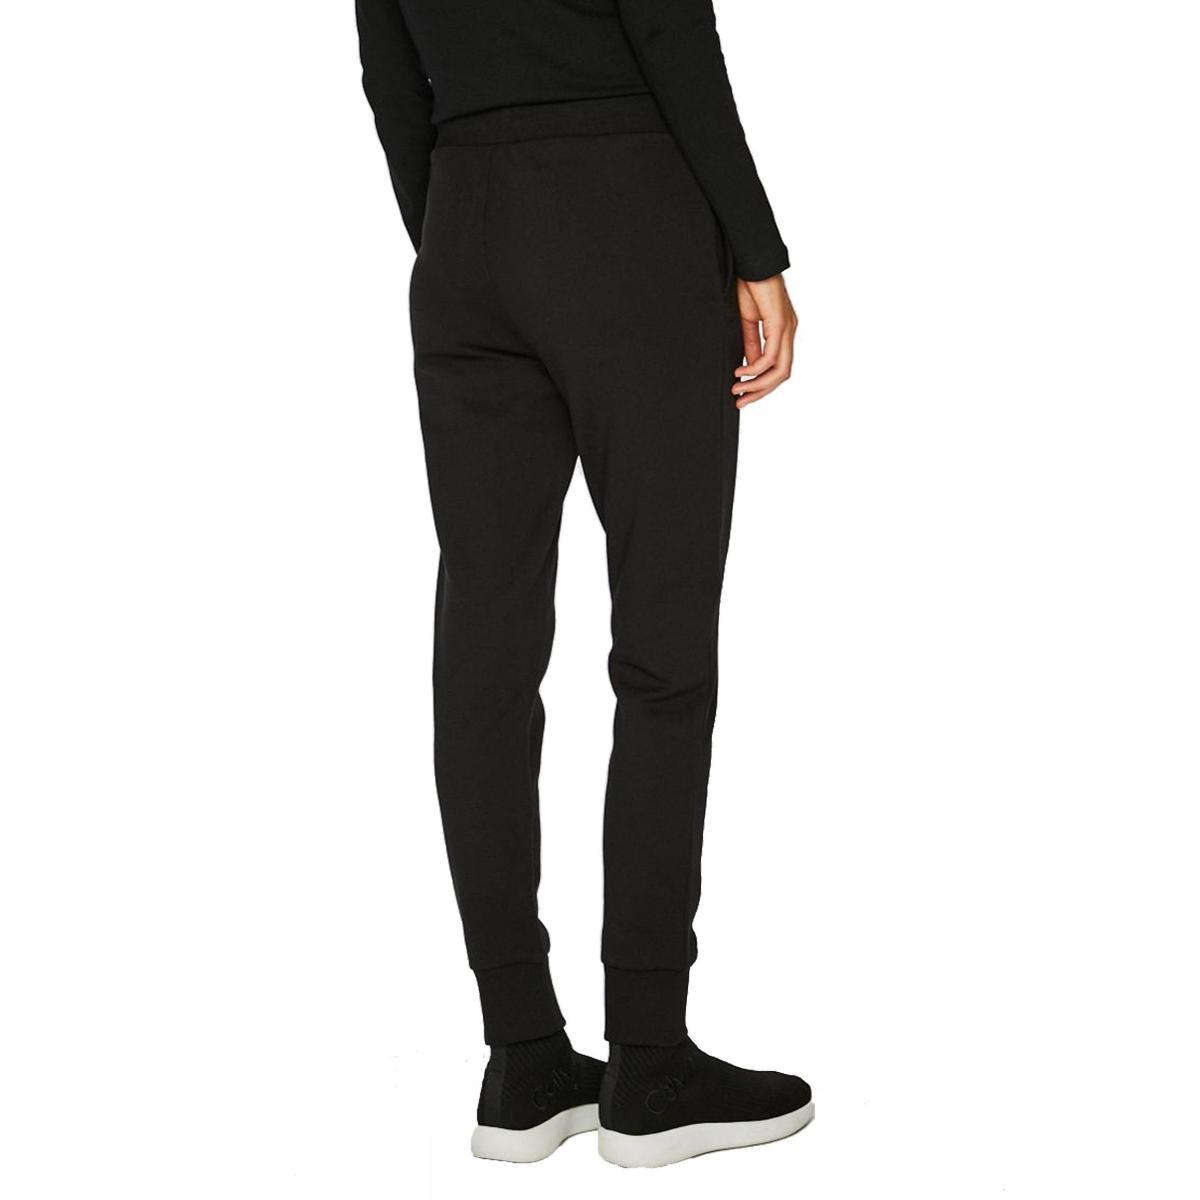 Pantalone tuta Calvin Klein Jeans da donna rif. J20J209556